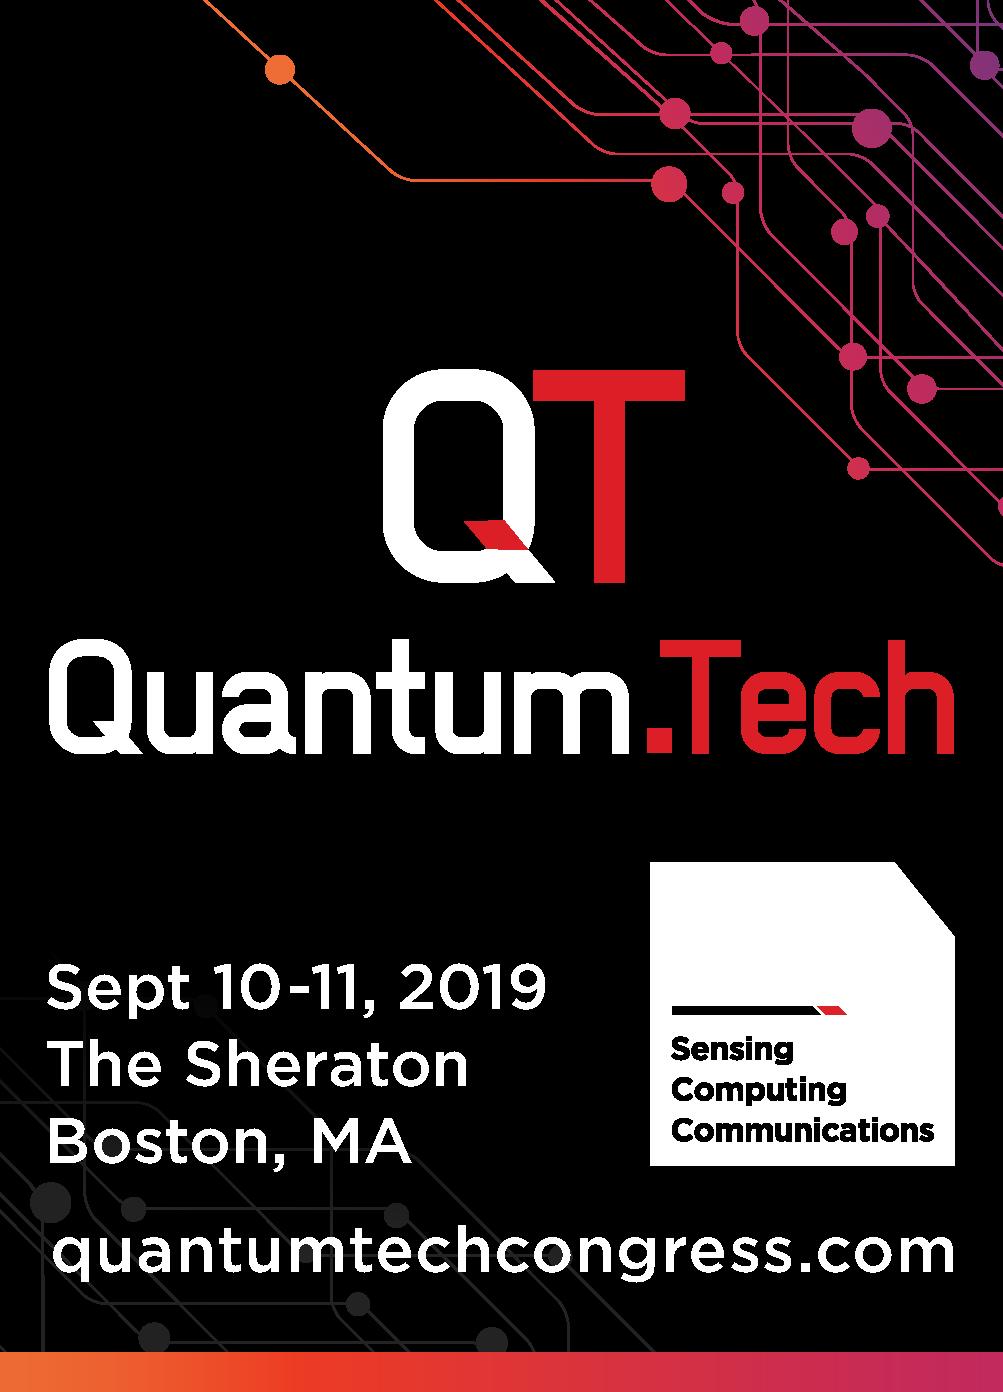 Quantum.Tech company attendee list